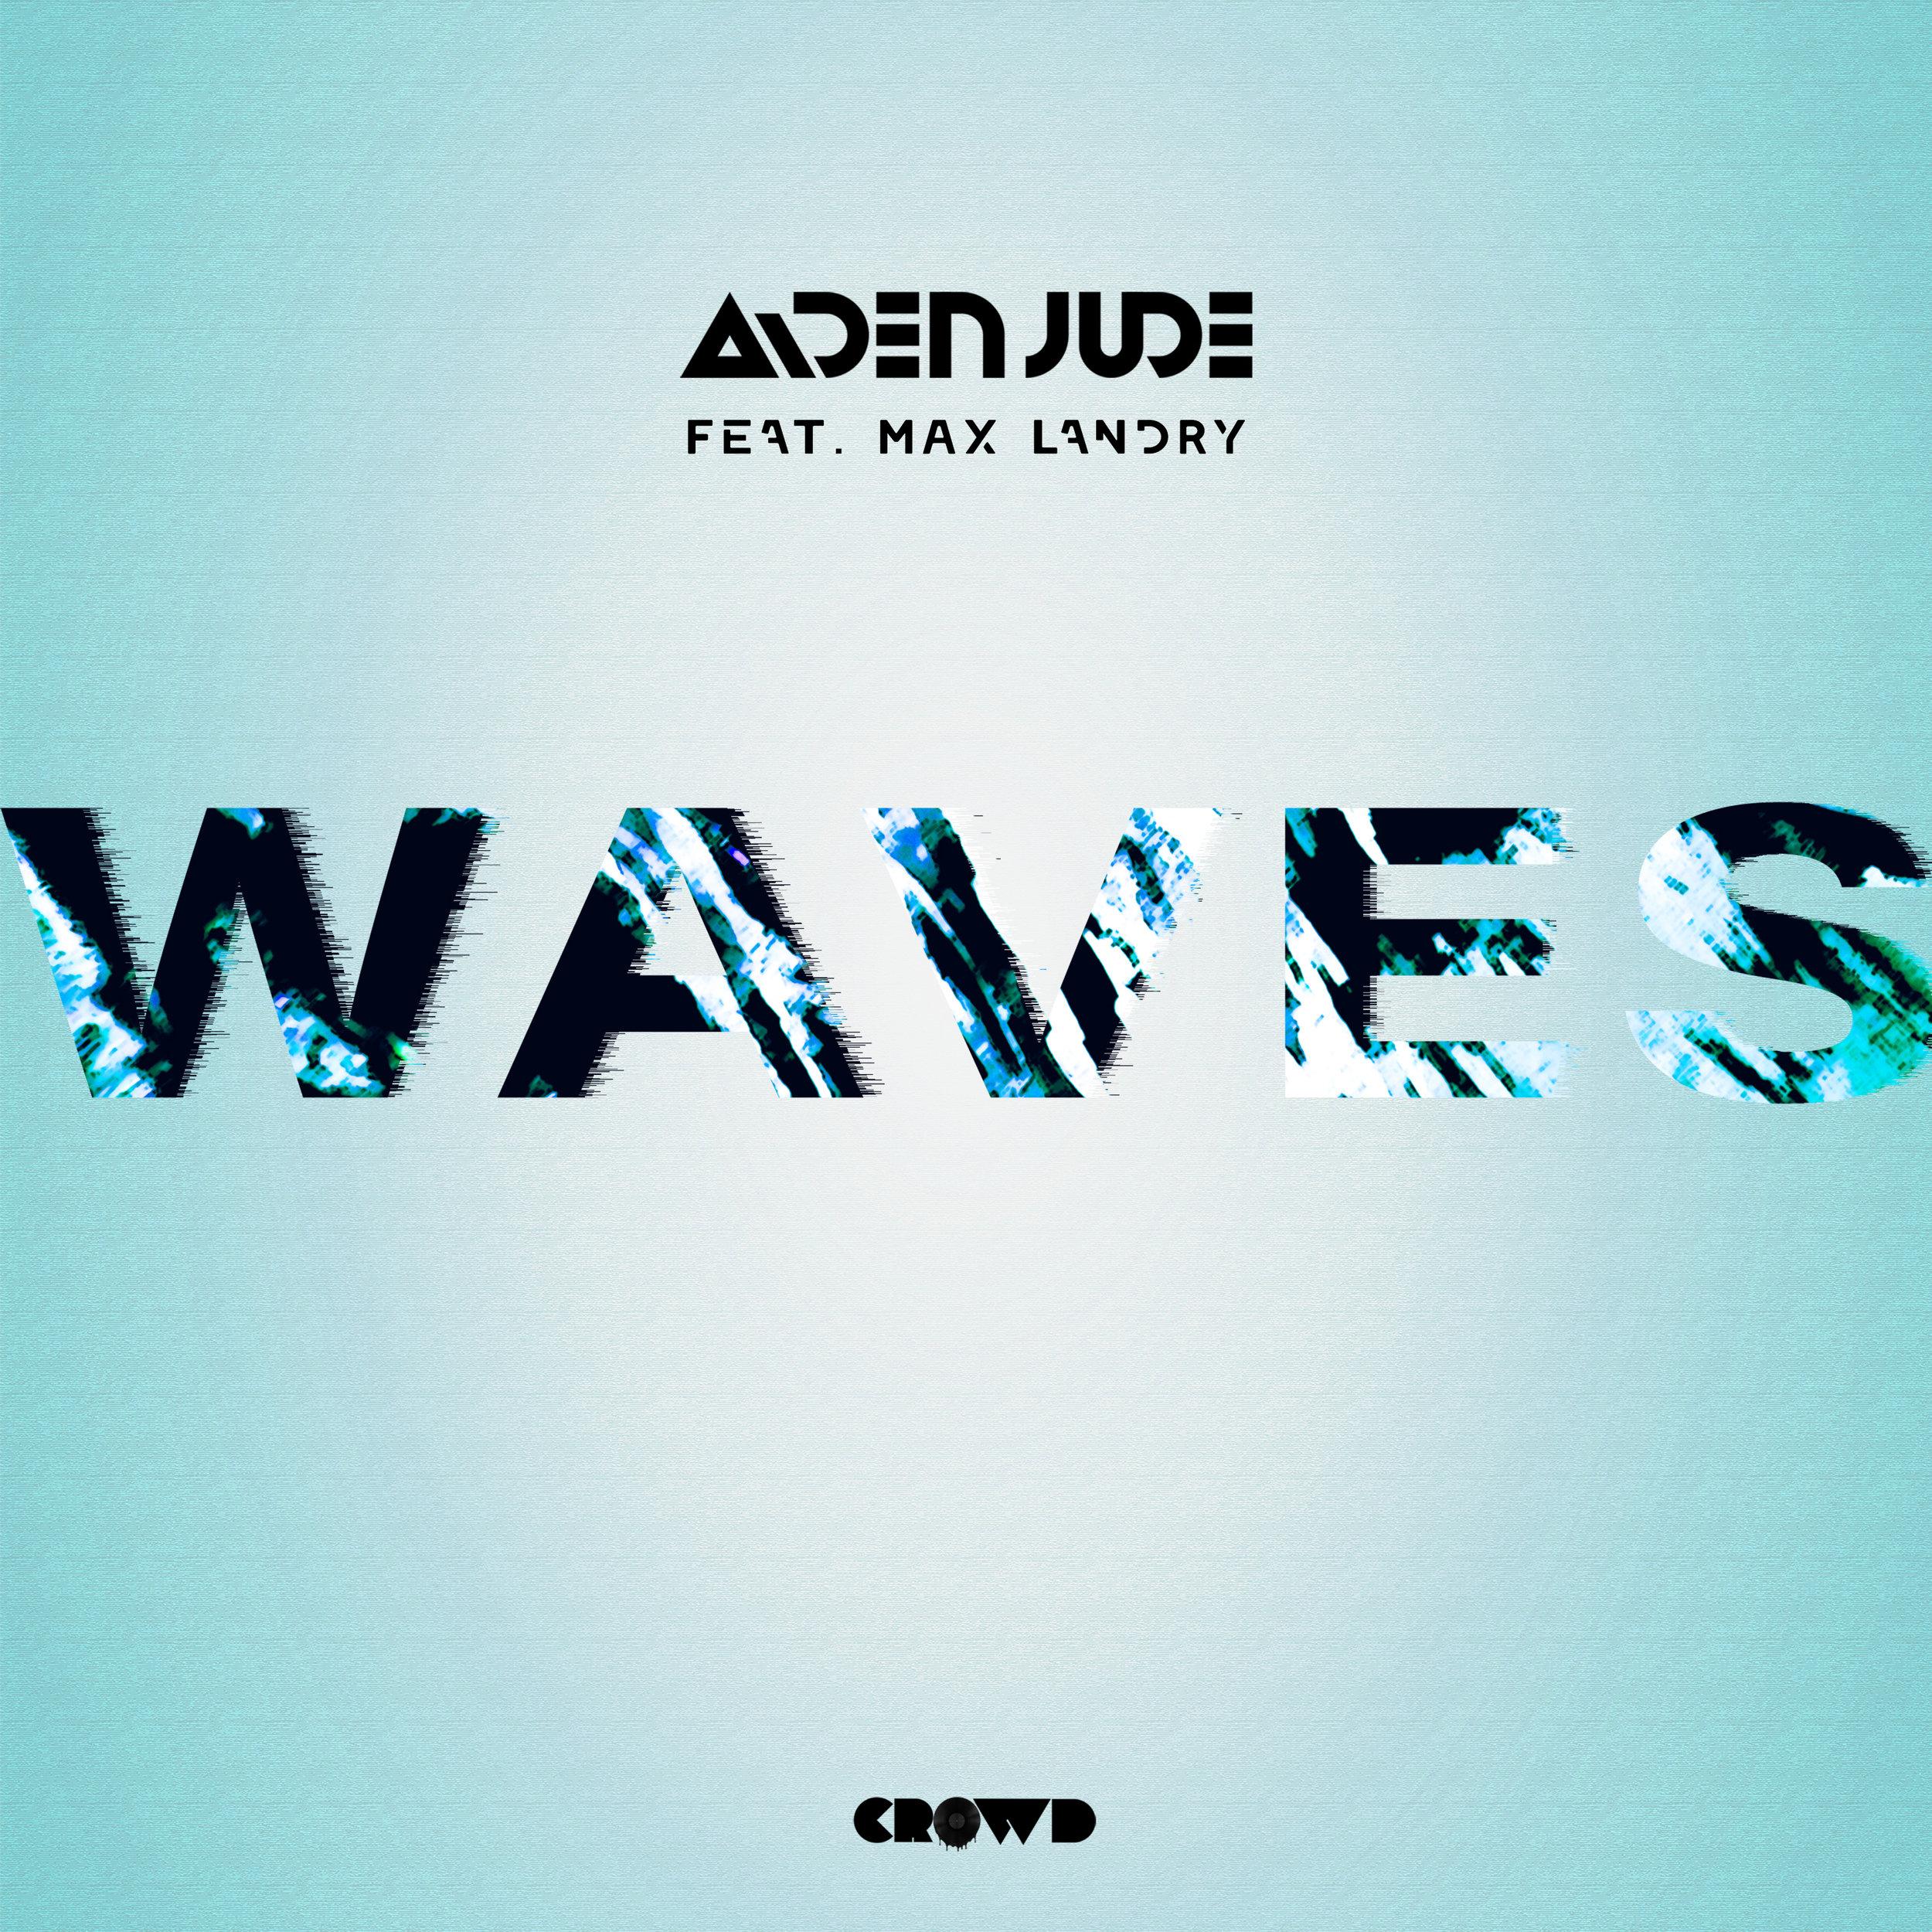 Waves (3000x3000x).jpg